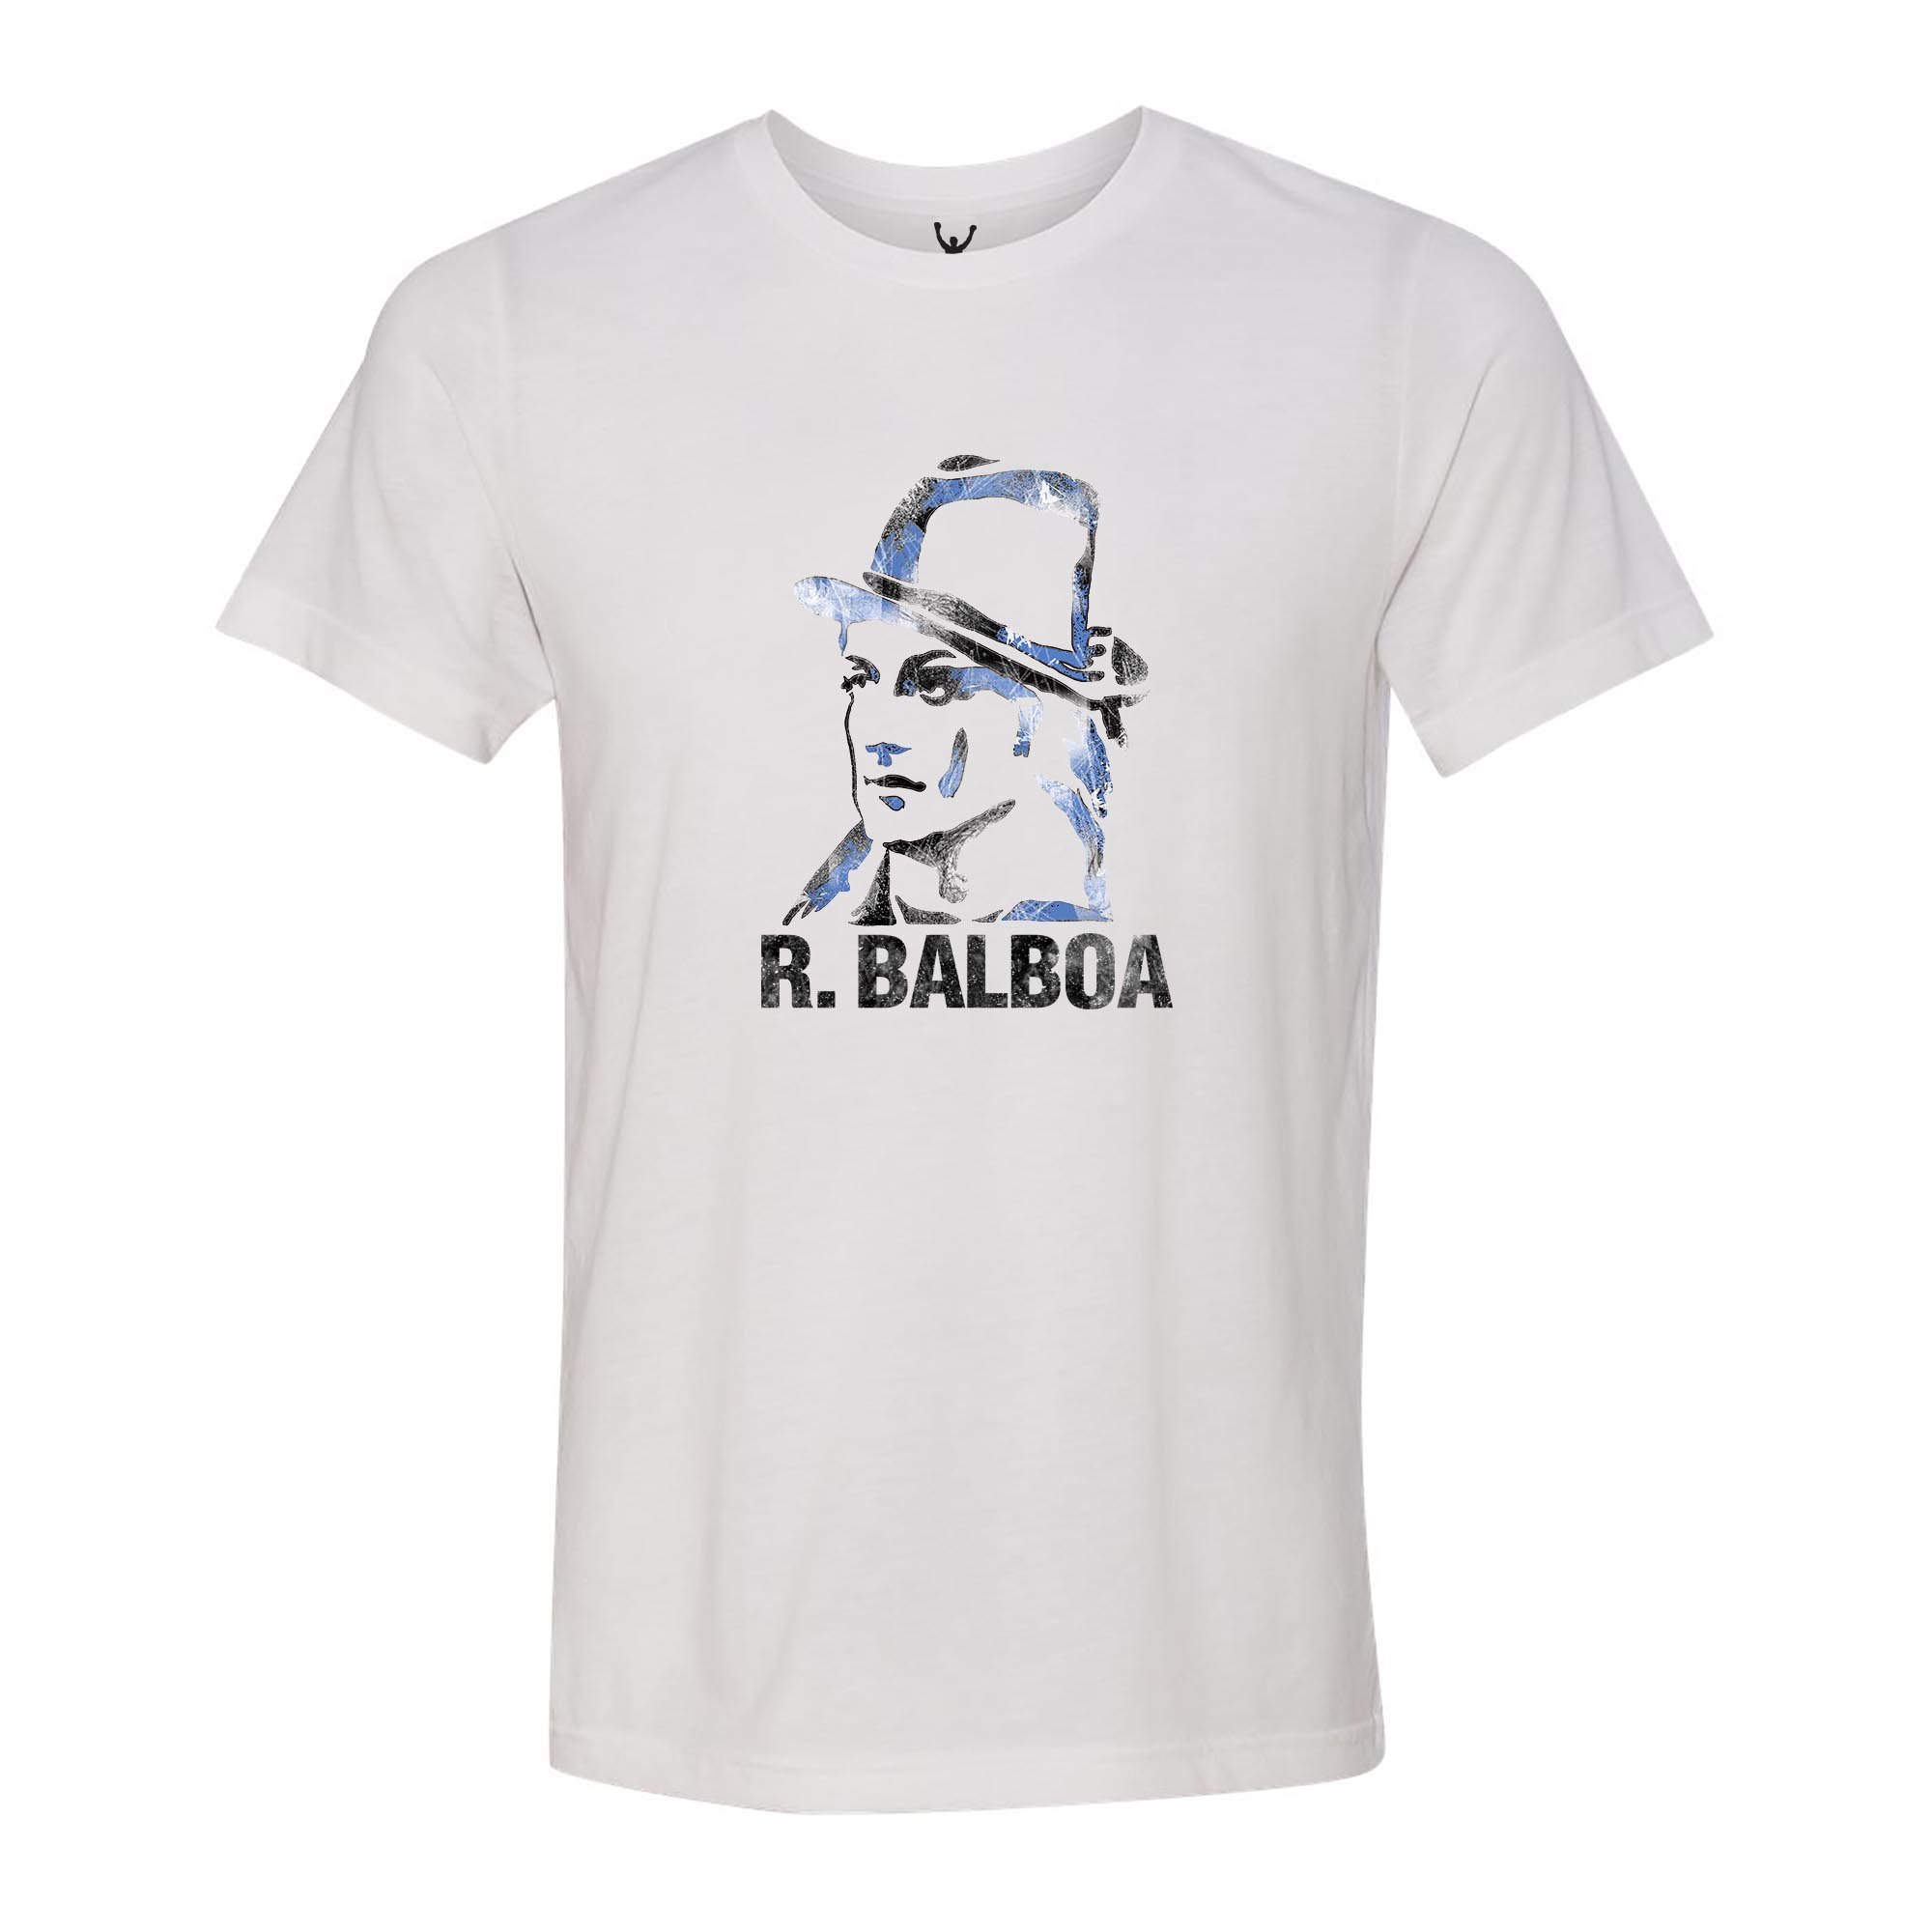 R. Balboa Tee